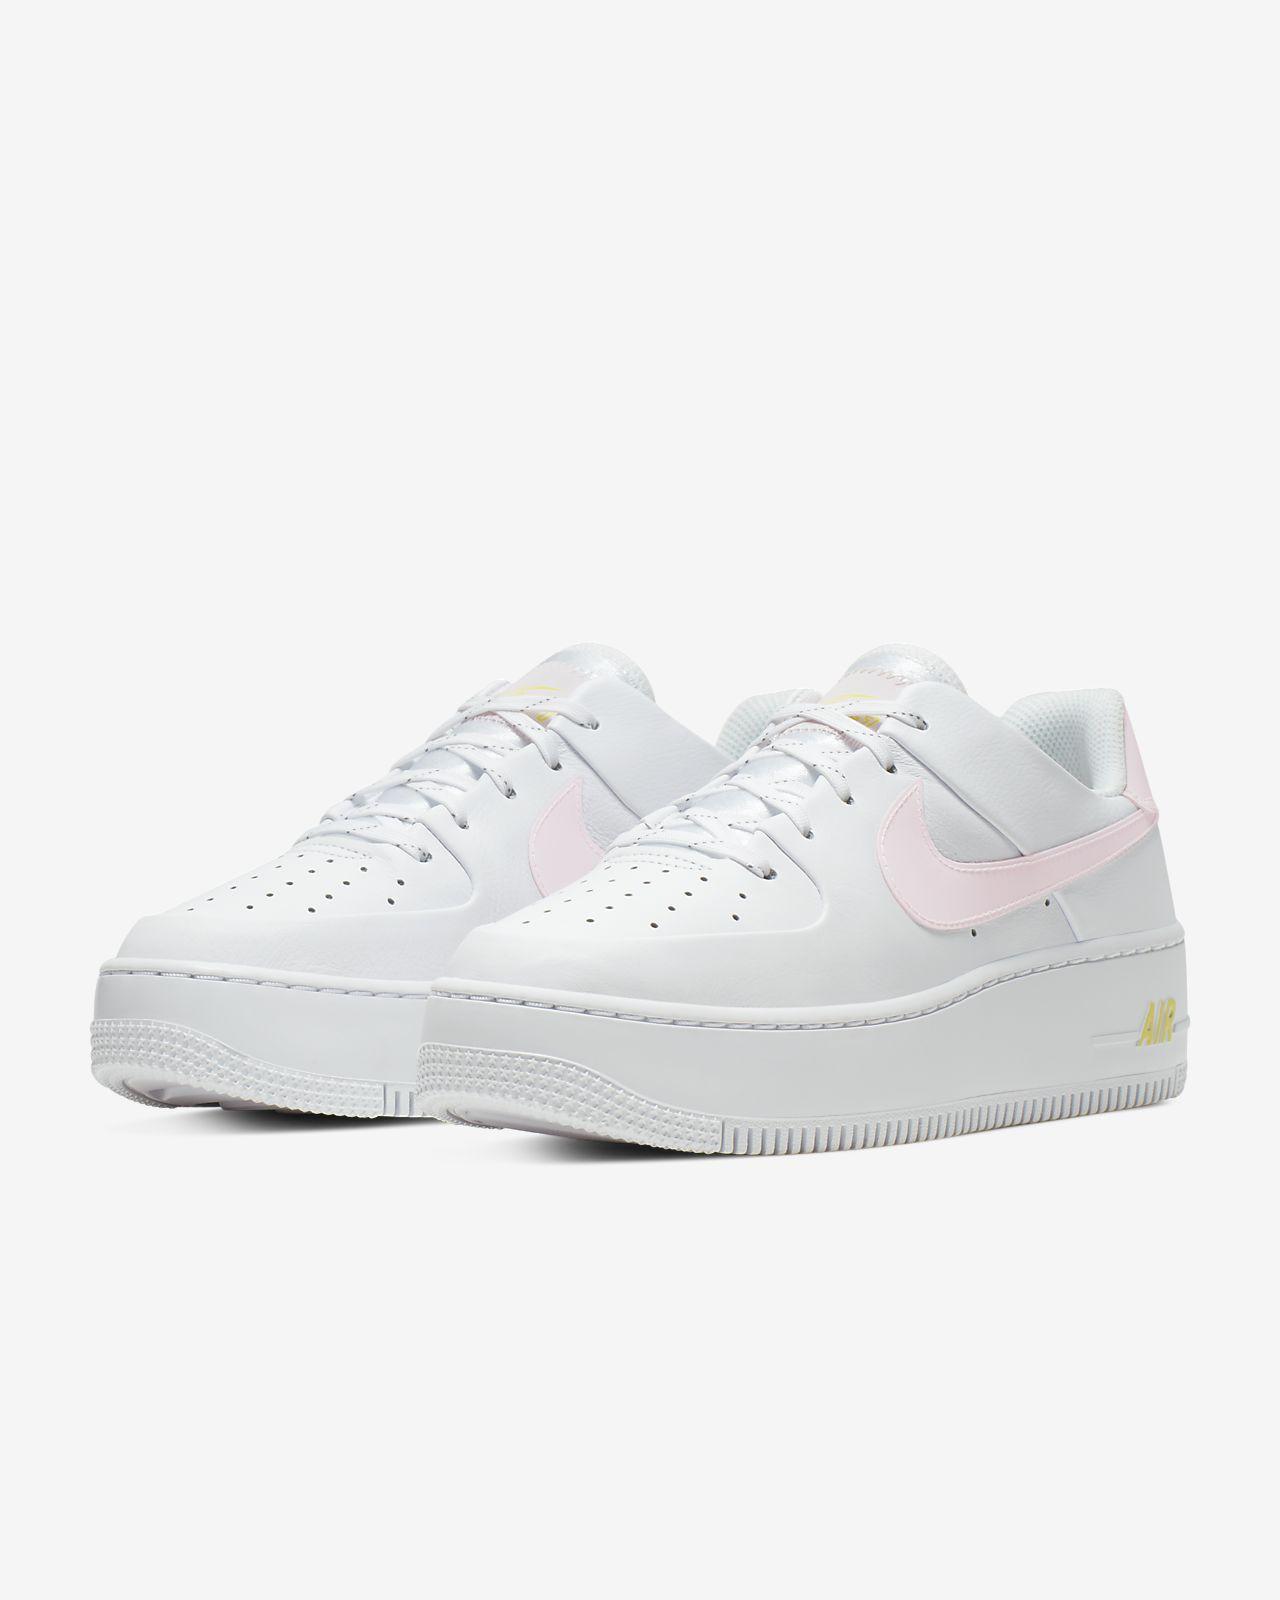 4b74501b97 Nike Air Force 1 Sage Women's Shoe